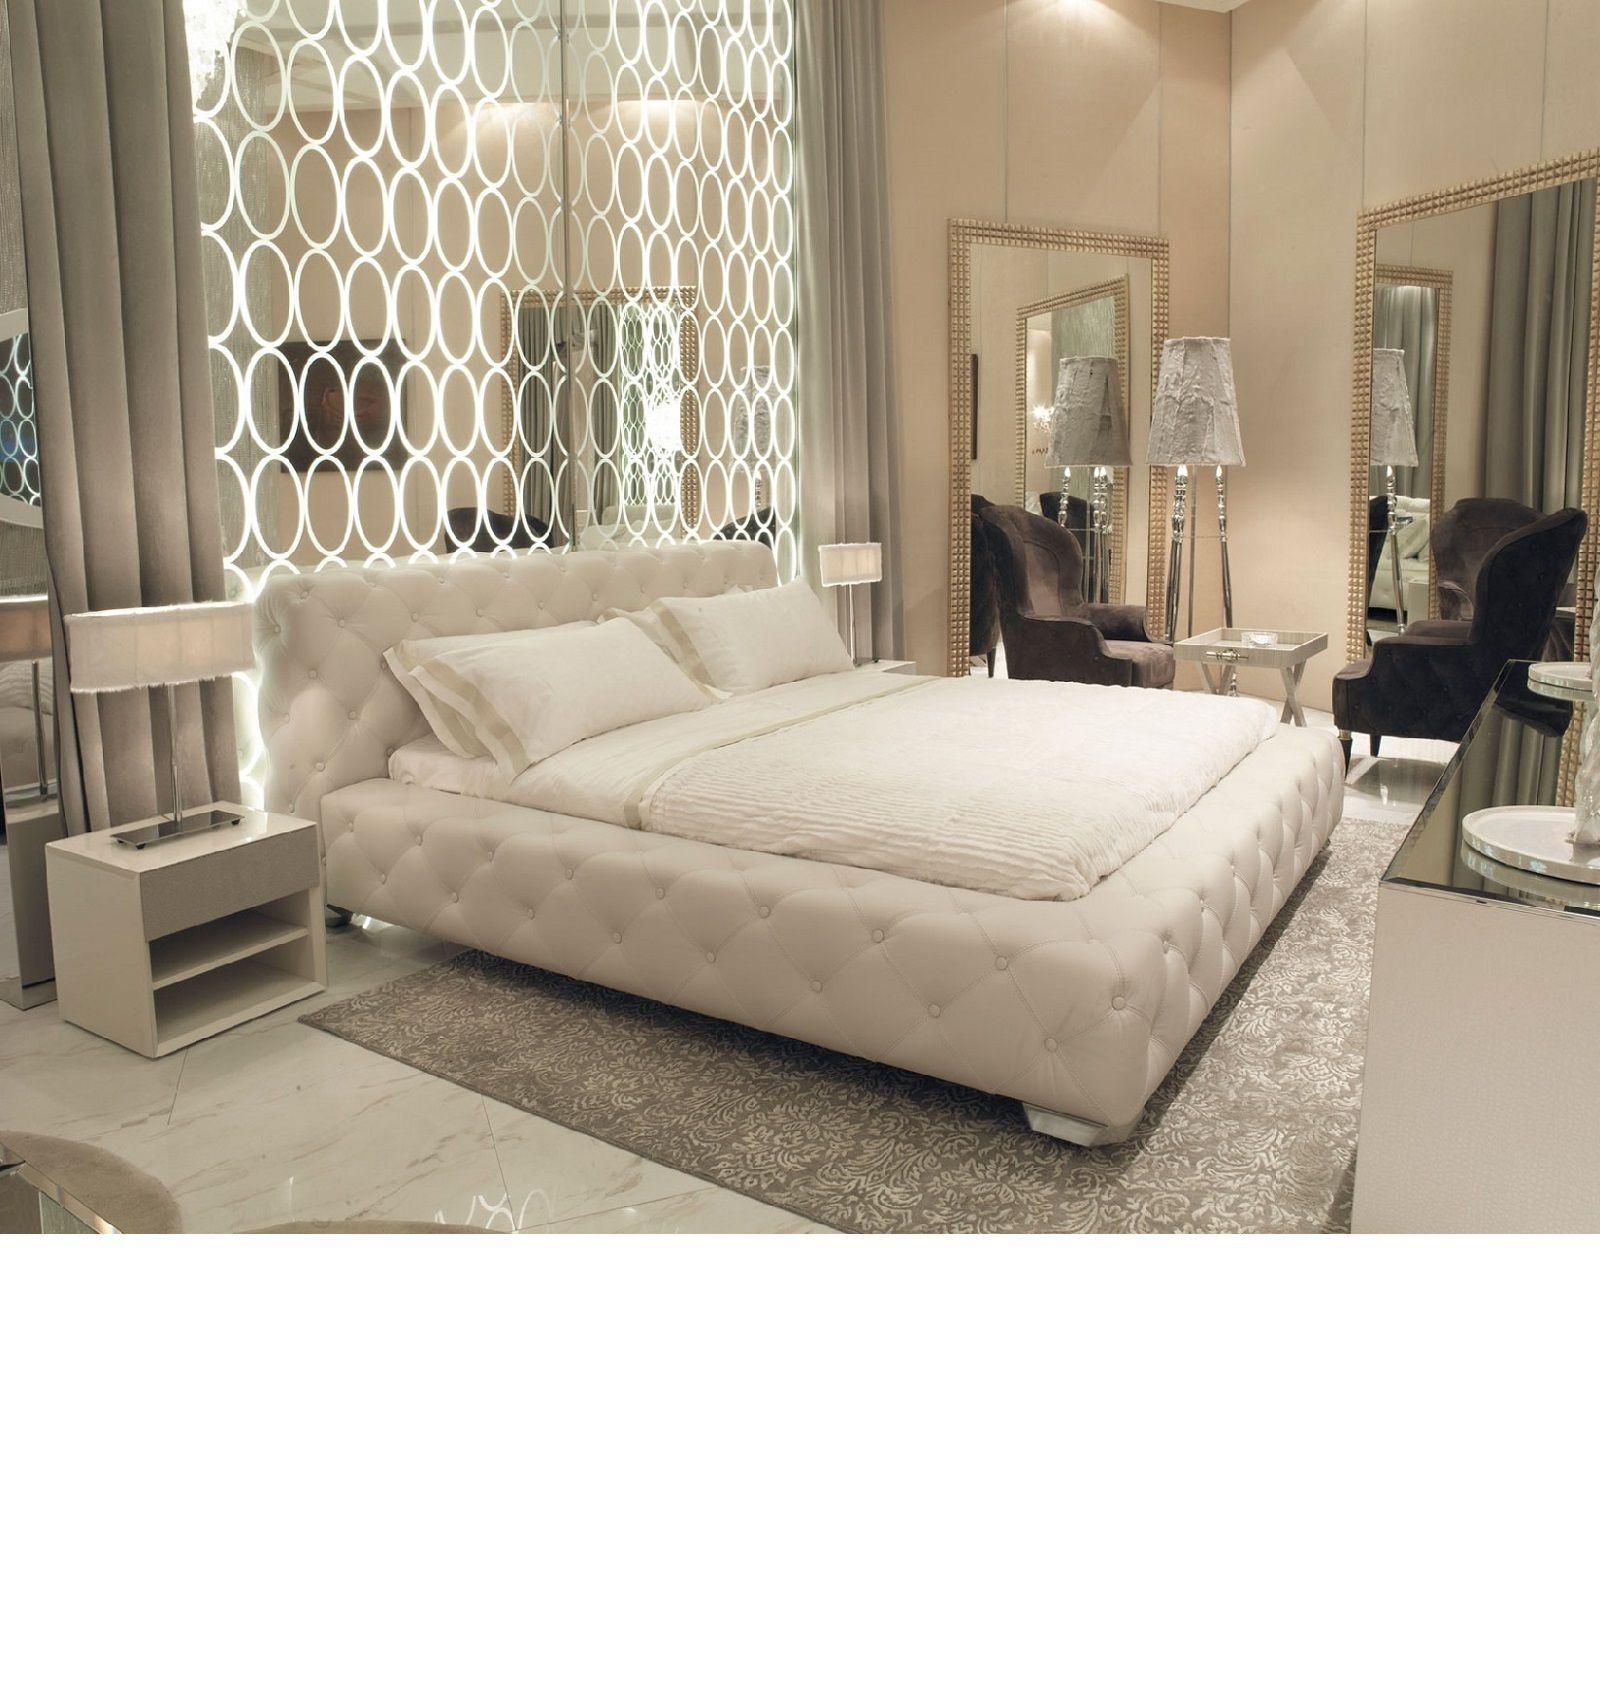 Ultra modern bedroom interior design peaceful sleep after hot bath speaks serenity bedroom decor